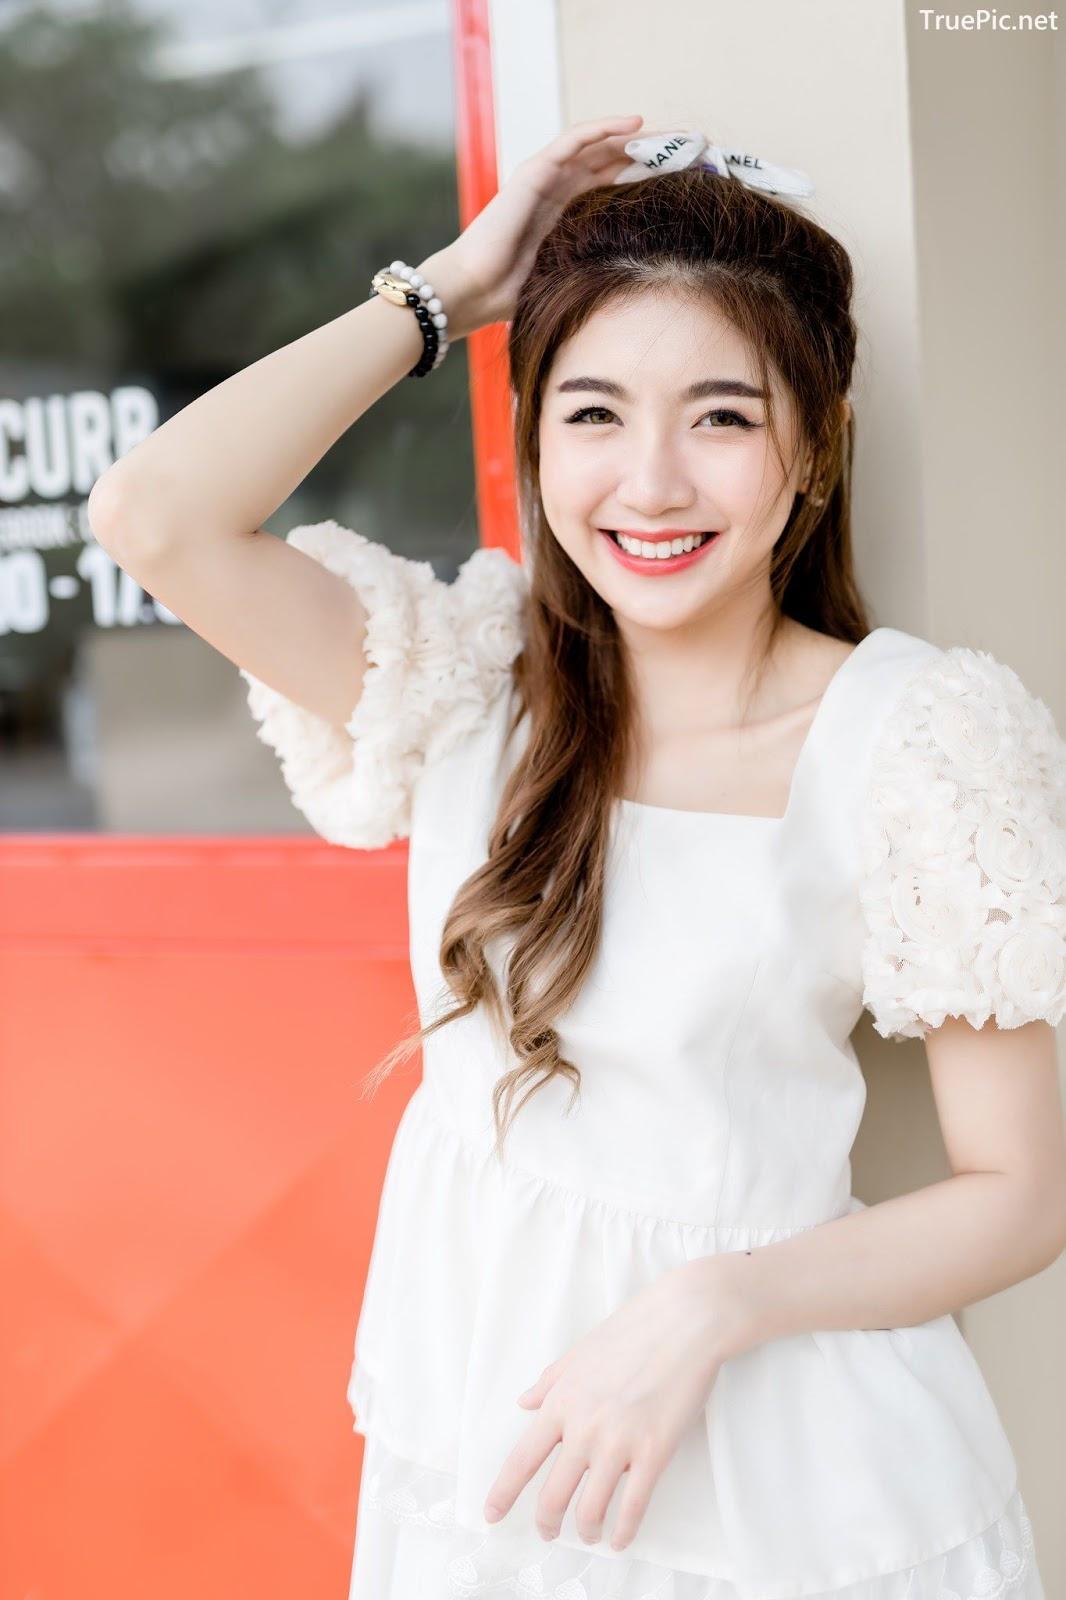 Image Thailand Model - Sasi Ngiunwan - Barbie Doll Smile - TruePic.net - Picture-13